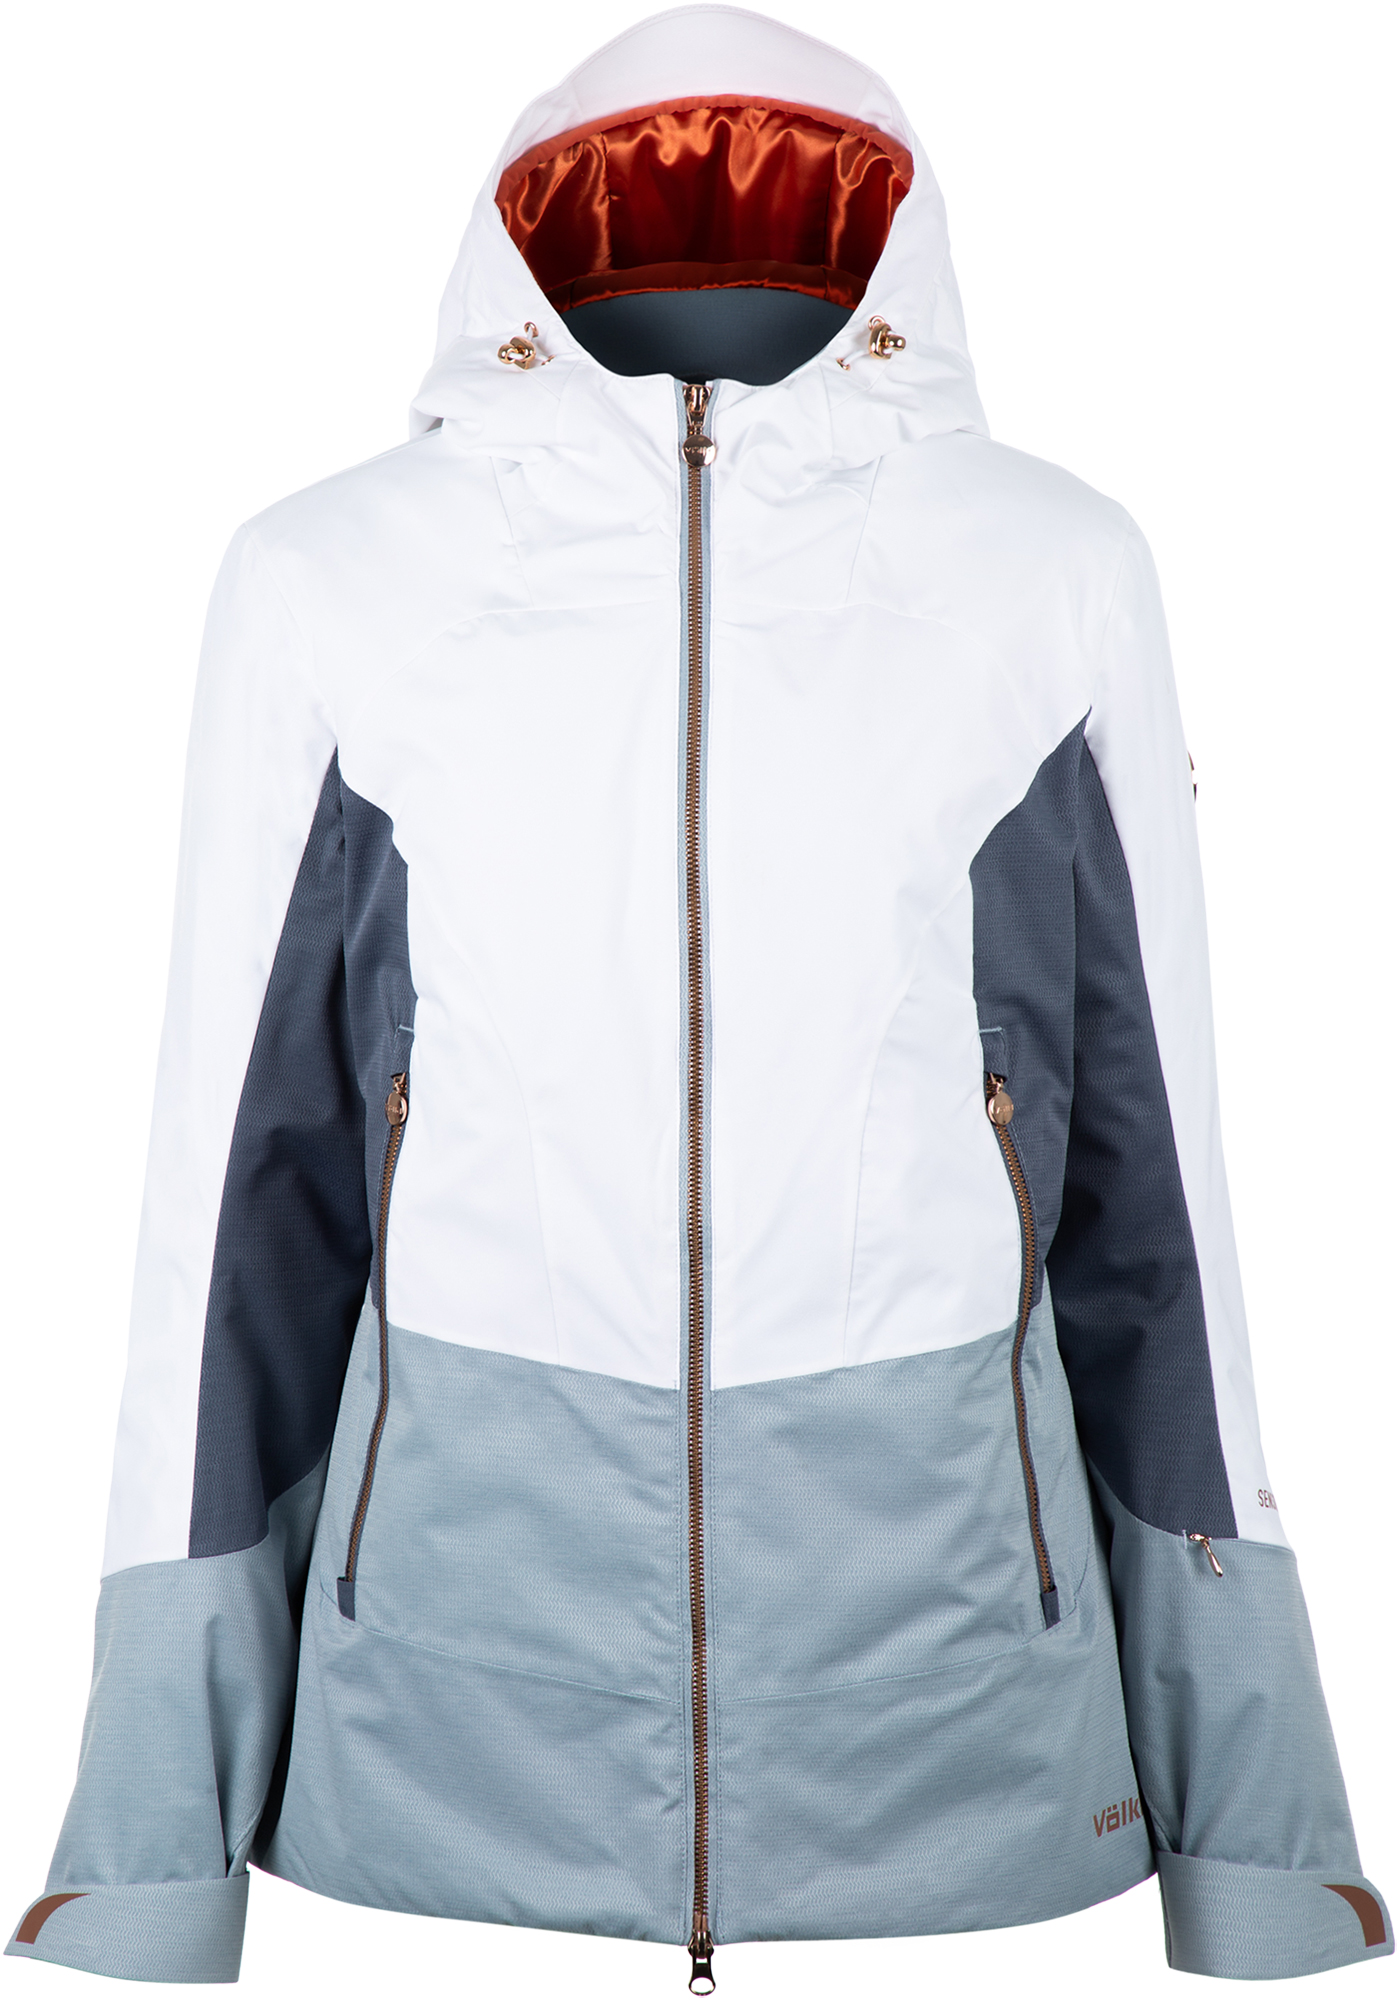 Volkl Куртка утепленная женская Volkl, размер 42 volkl volkl flair sc vmotion 11 alu gw lady 18 19 размер 158